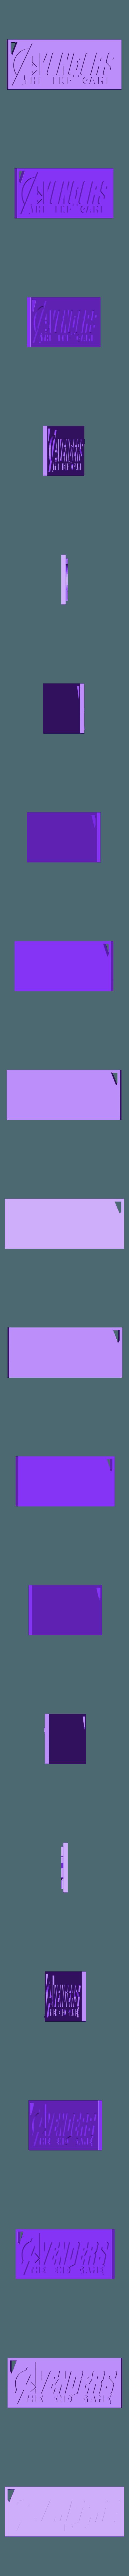 keychainAvengers 2_1.STL Download free STL file KEYCHAIN AVENGERS SYMBOL No.2 (THE END GAME) • 3D printer model, Tum